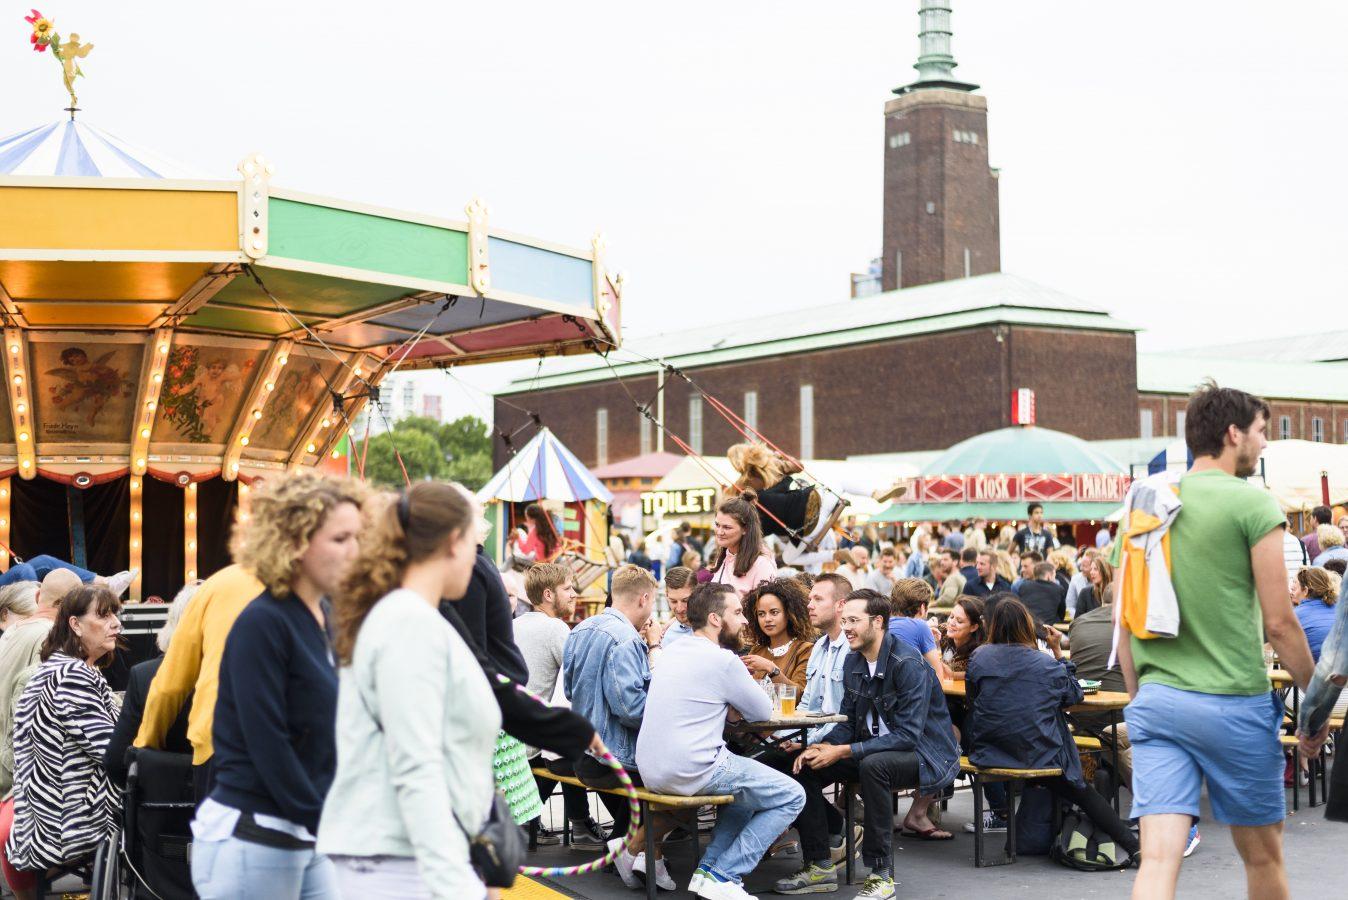 Foodfestival in Rotterdam